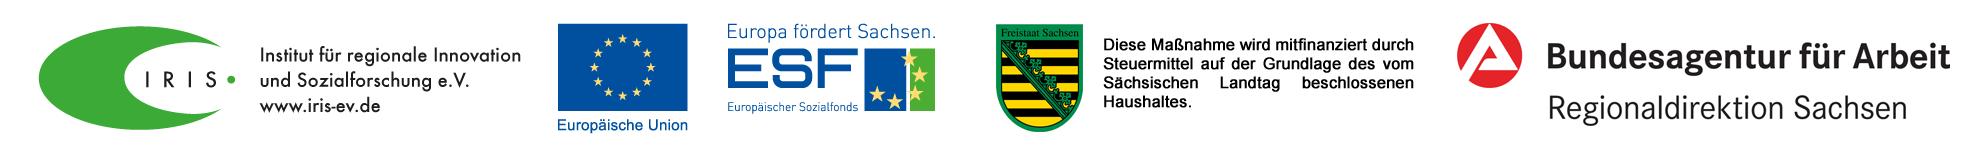 iris_AA_esf_sachsen_logokombi